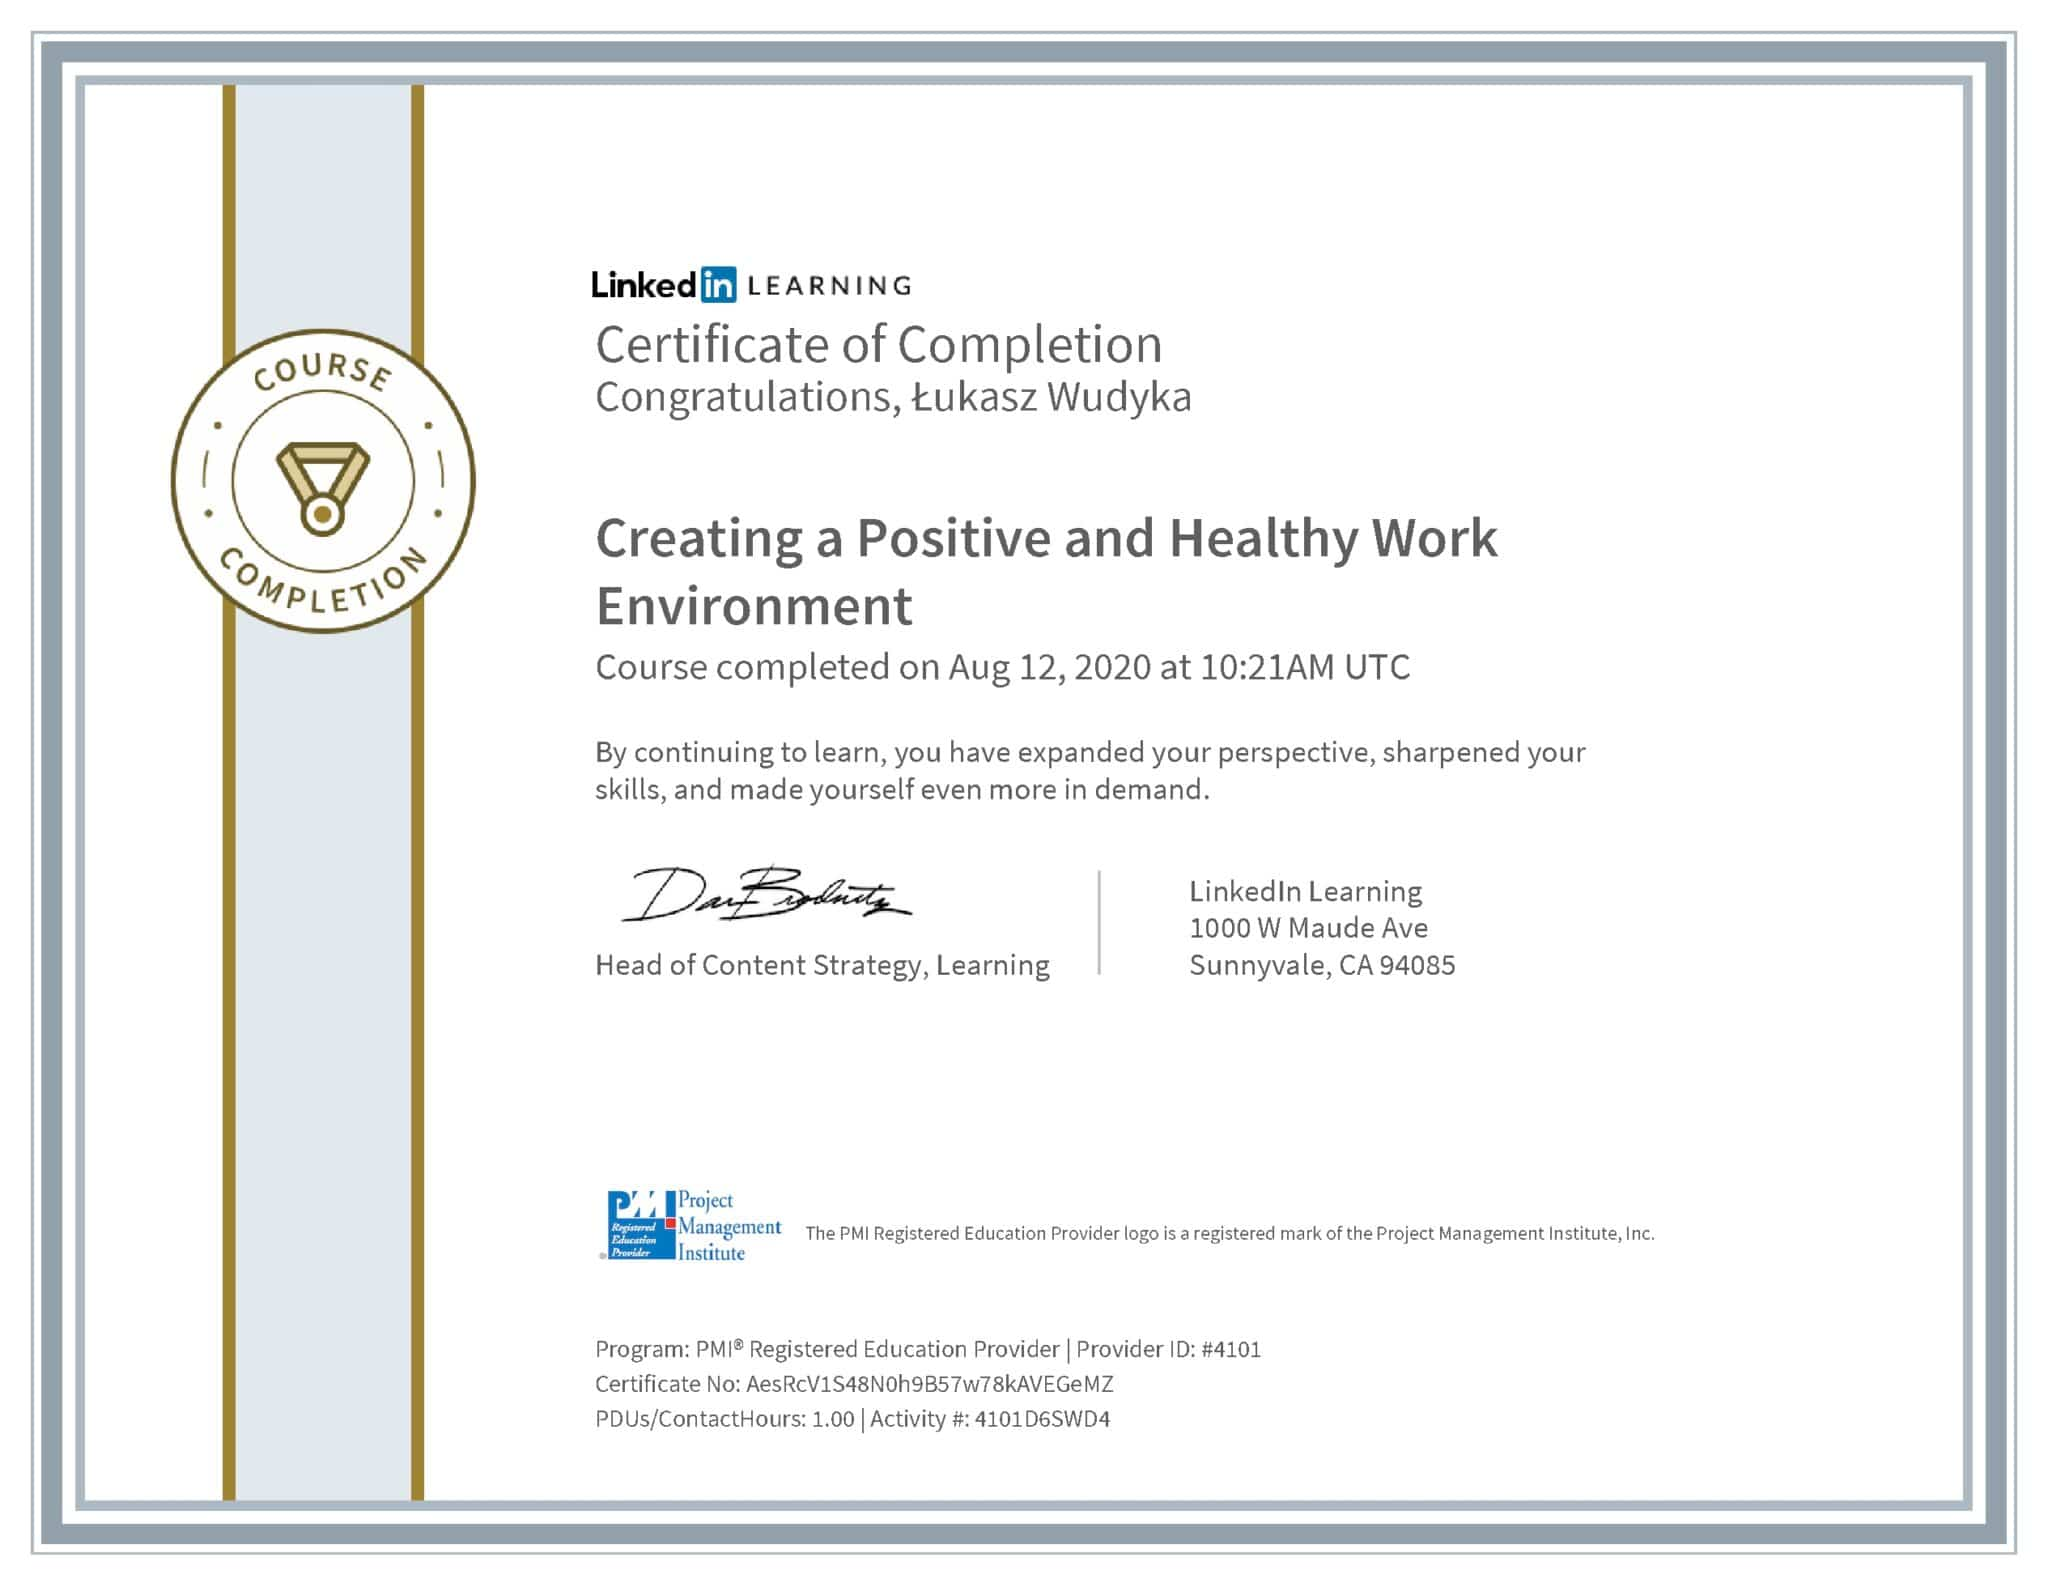 Łukasz Wudyka certyfikat LinkedIn Creating a Positive and Healthy Work Environment PMI